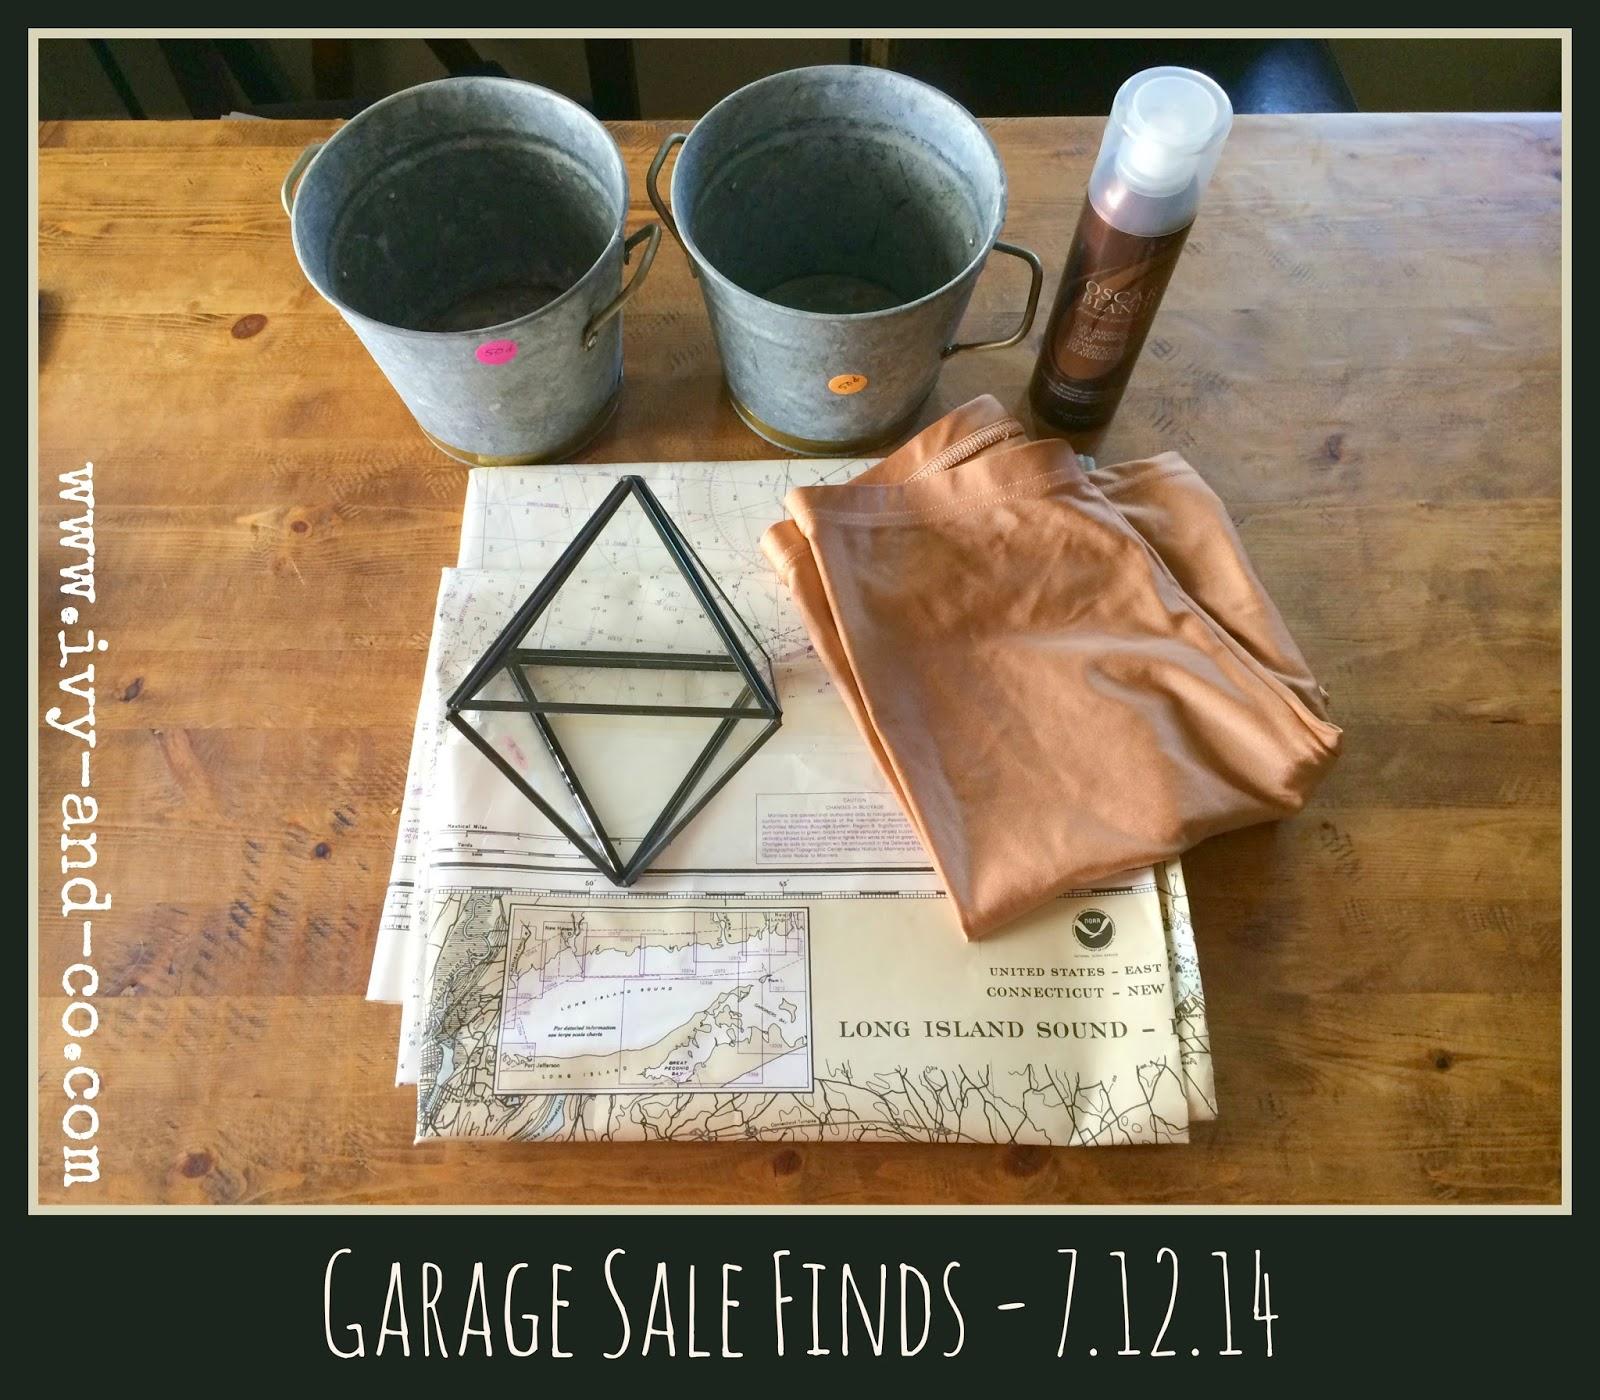 garage sale finds treasures deals in Maui Hawaii